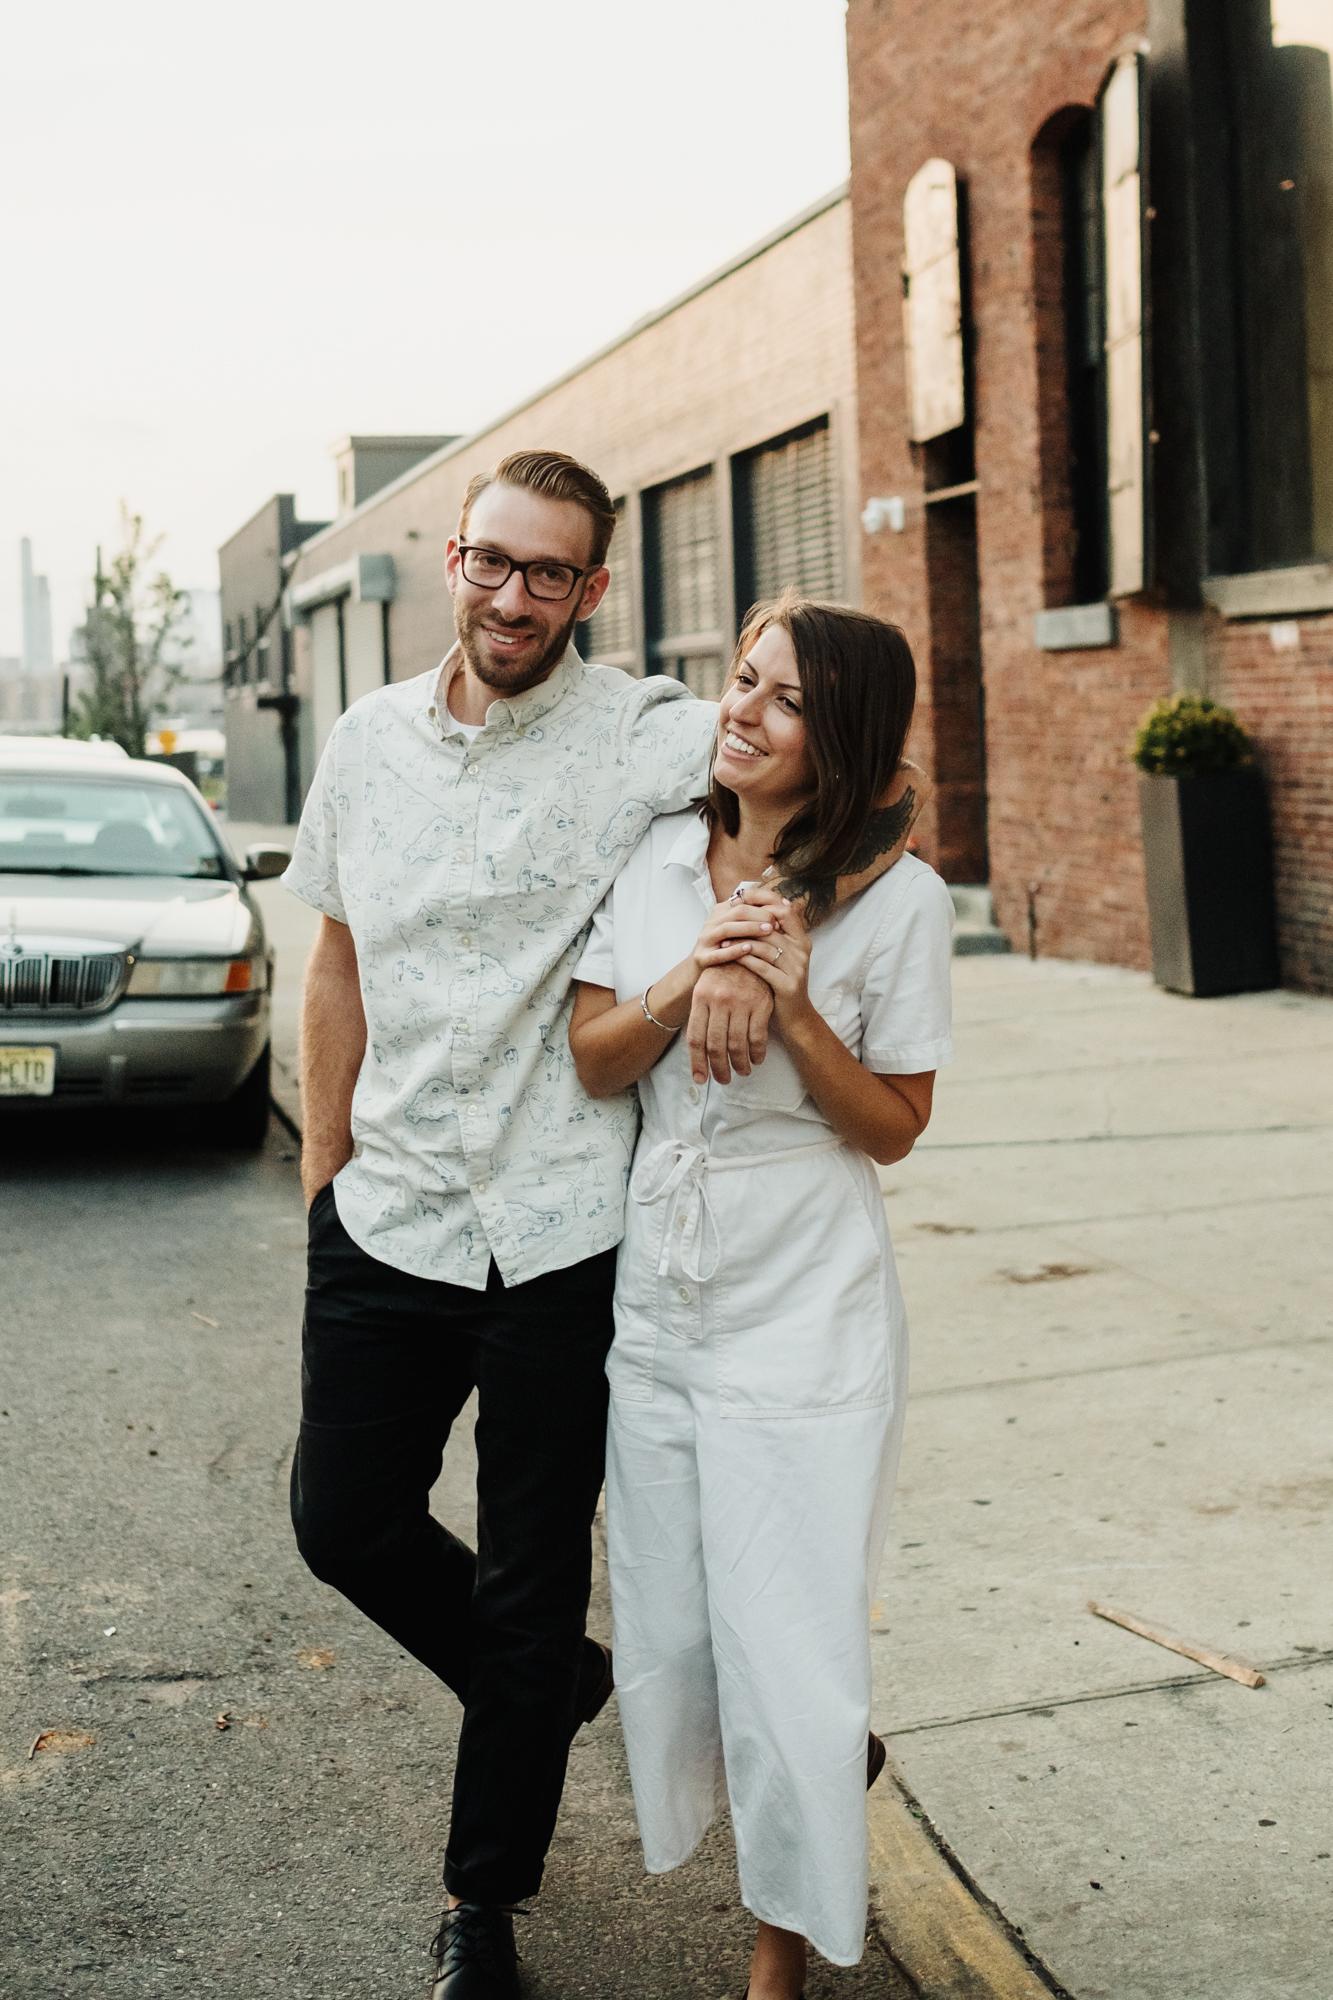 Wedding_Francis_Boucher_Photography_Brooklyn_engagement_2018-51.jpg